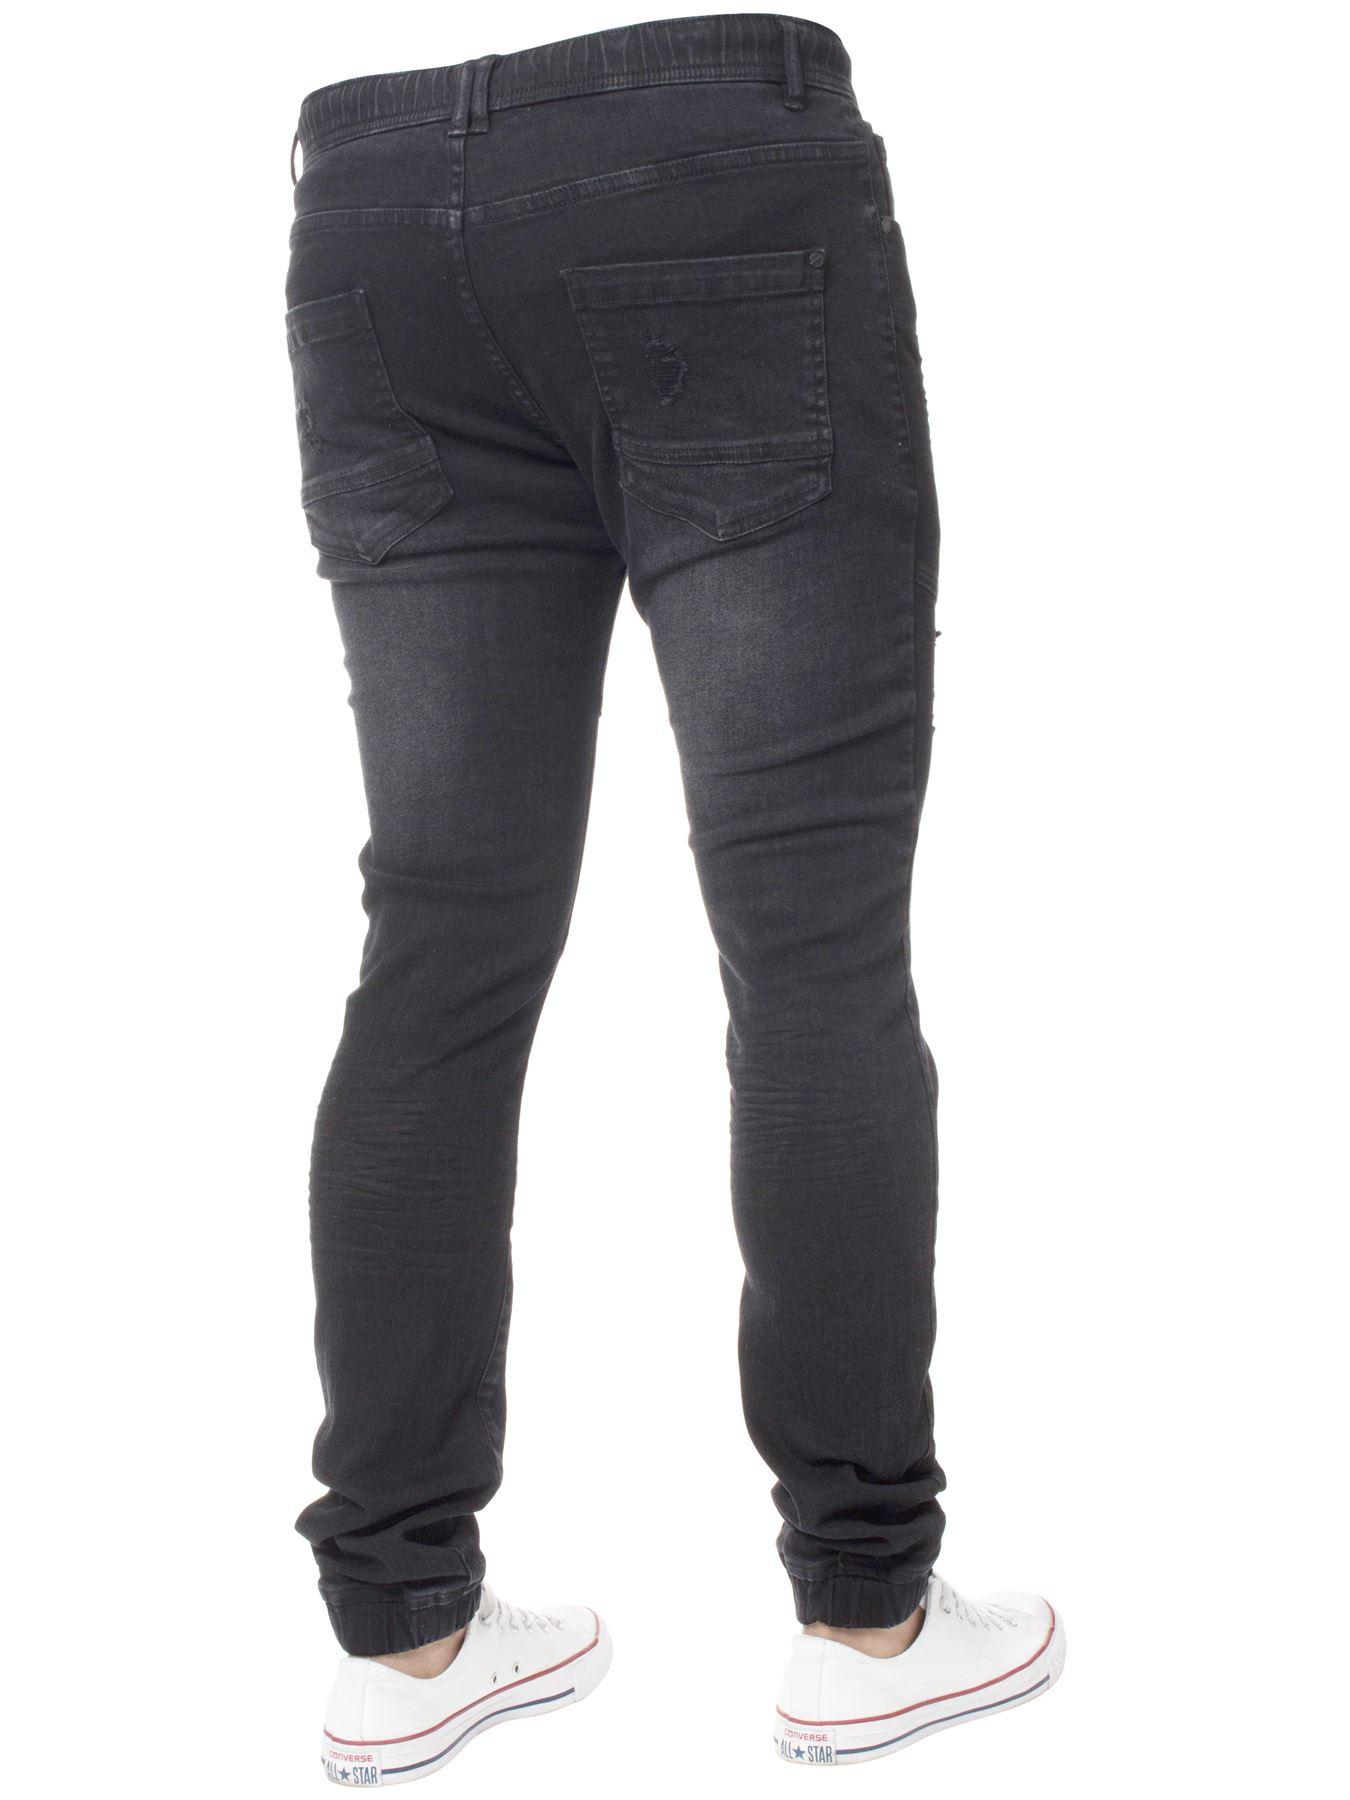 Enzo-Mens-Cuffed-Jeans-Stretch-Fit-Ripped-Denim-Jogger-Pants-Big-Tall-All-Waists thumbnail 4